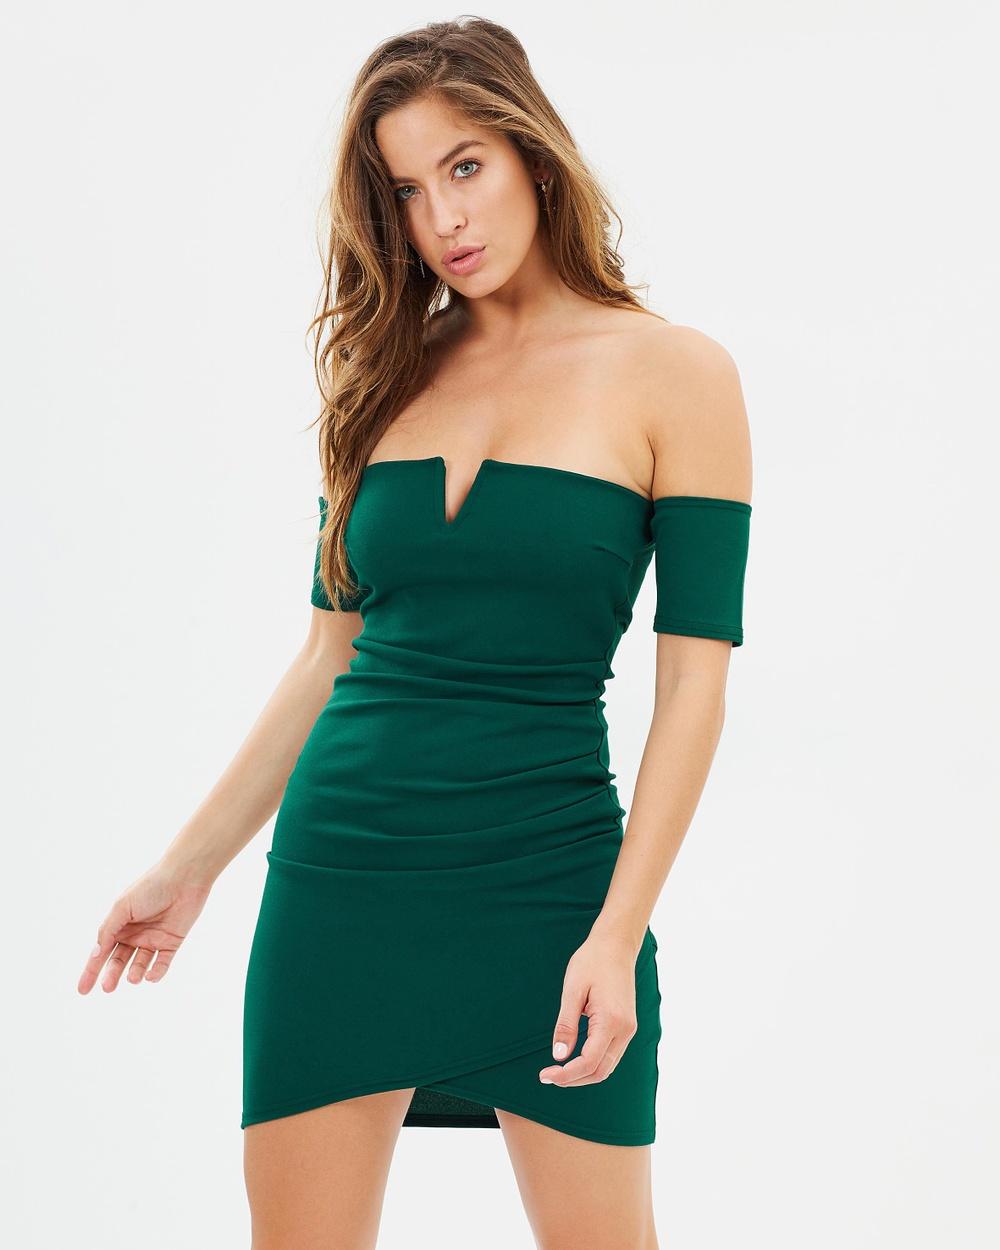 Missguided Bardot V Neck Mini Dress Bodycon Dresses Teal Bardot V-Neck Mini Dress